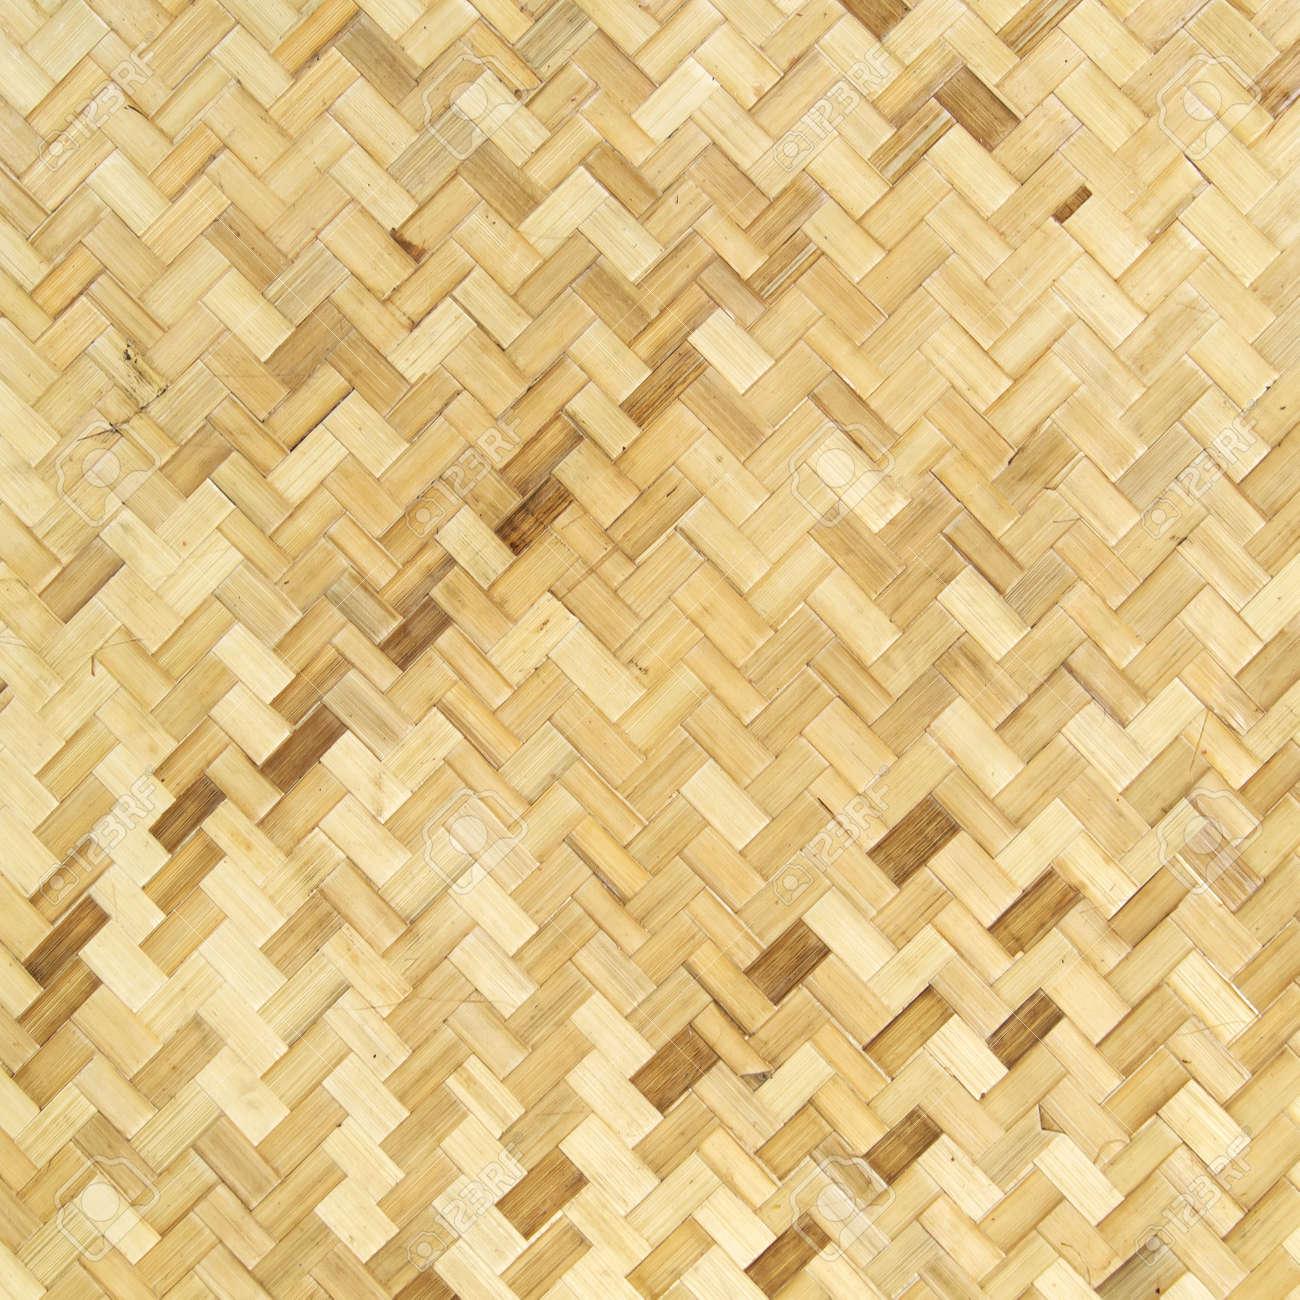 Native Thai style bamboo wall, natural wickerwork Stock Photo - 13853434